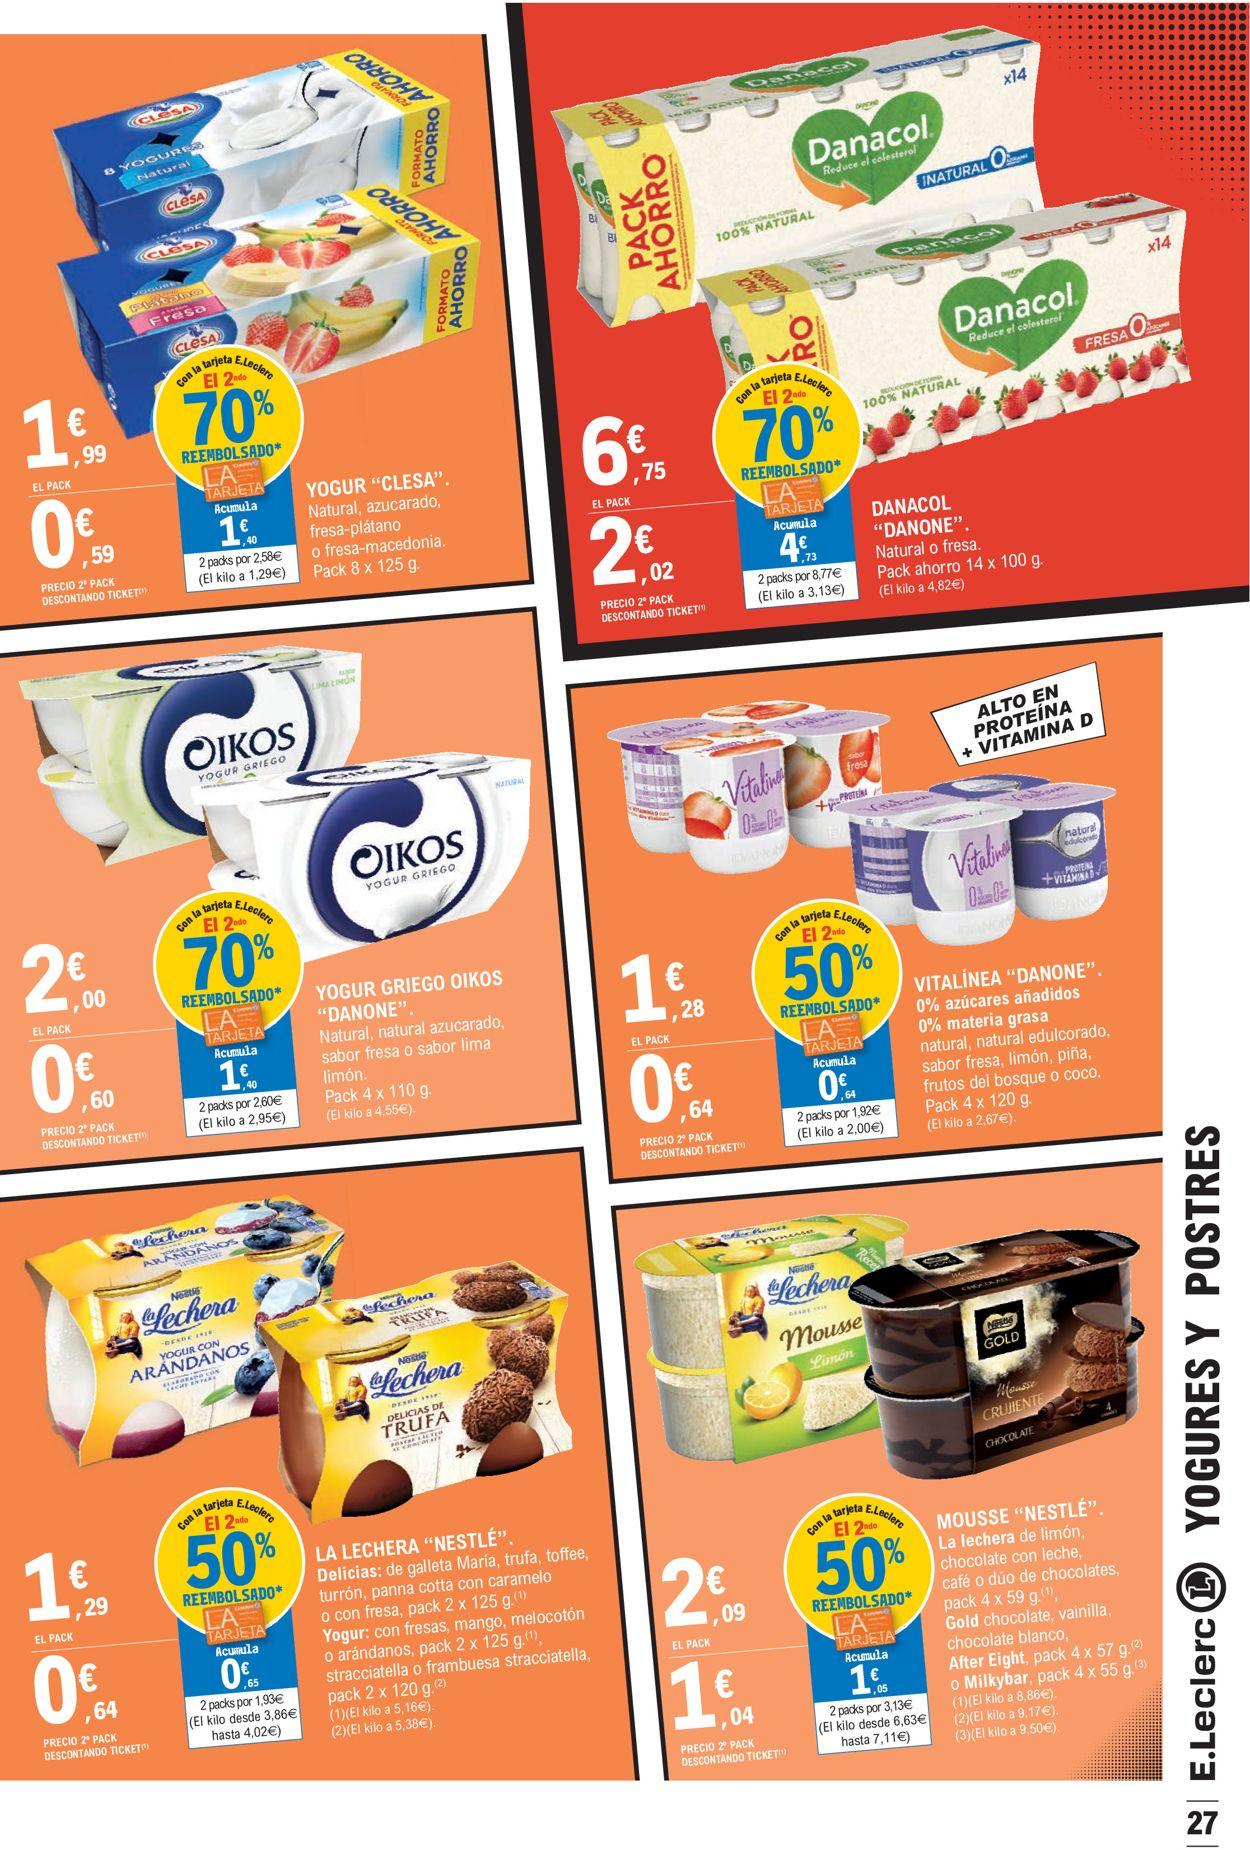 E.leclerc Folleto - 26.05-06.06.2021 (Página 27)